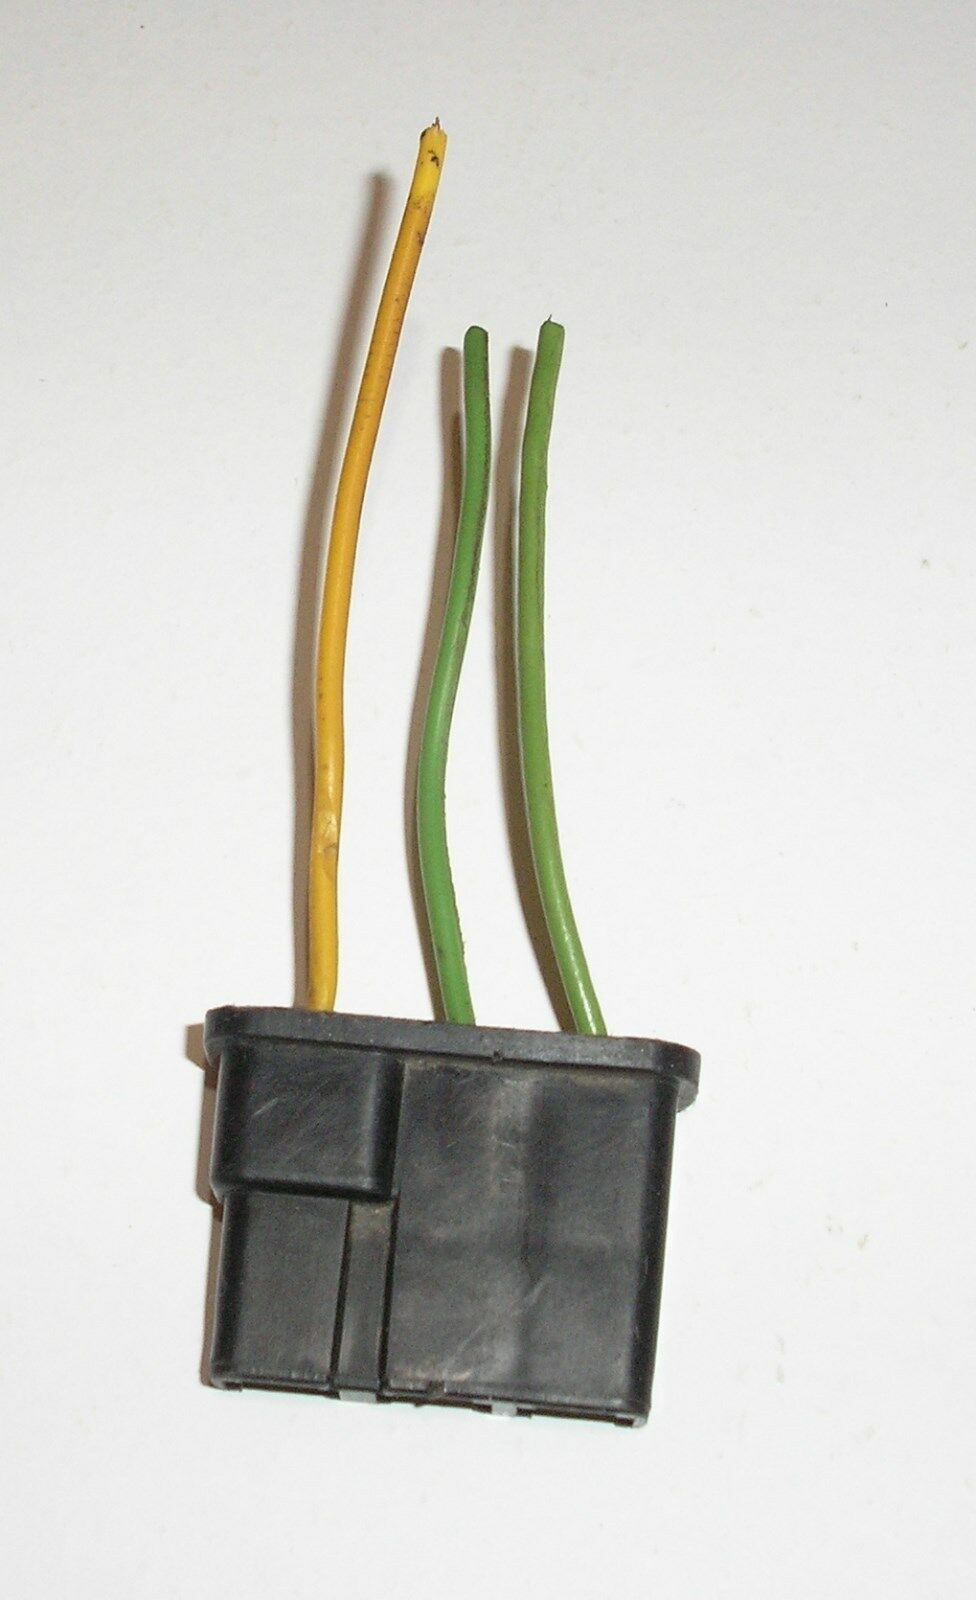 radio connector wire delco truck am fm chevy harness plug. Black Bedroom Furniture Sets. Home Design Ideas